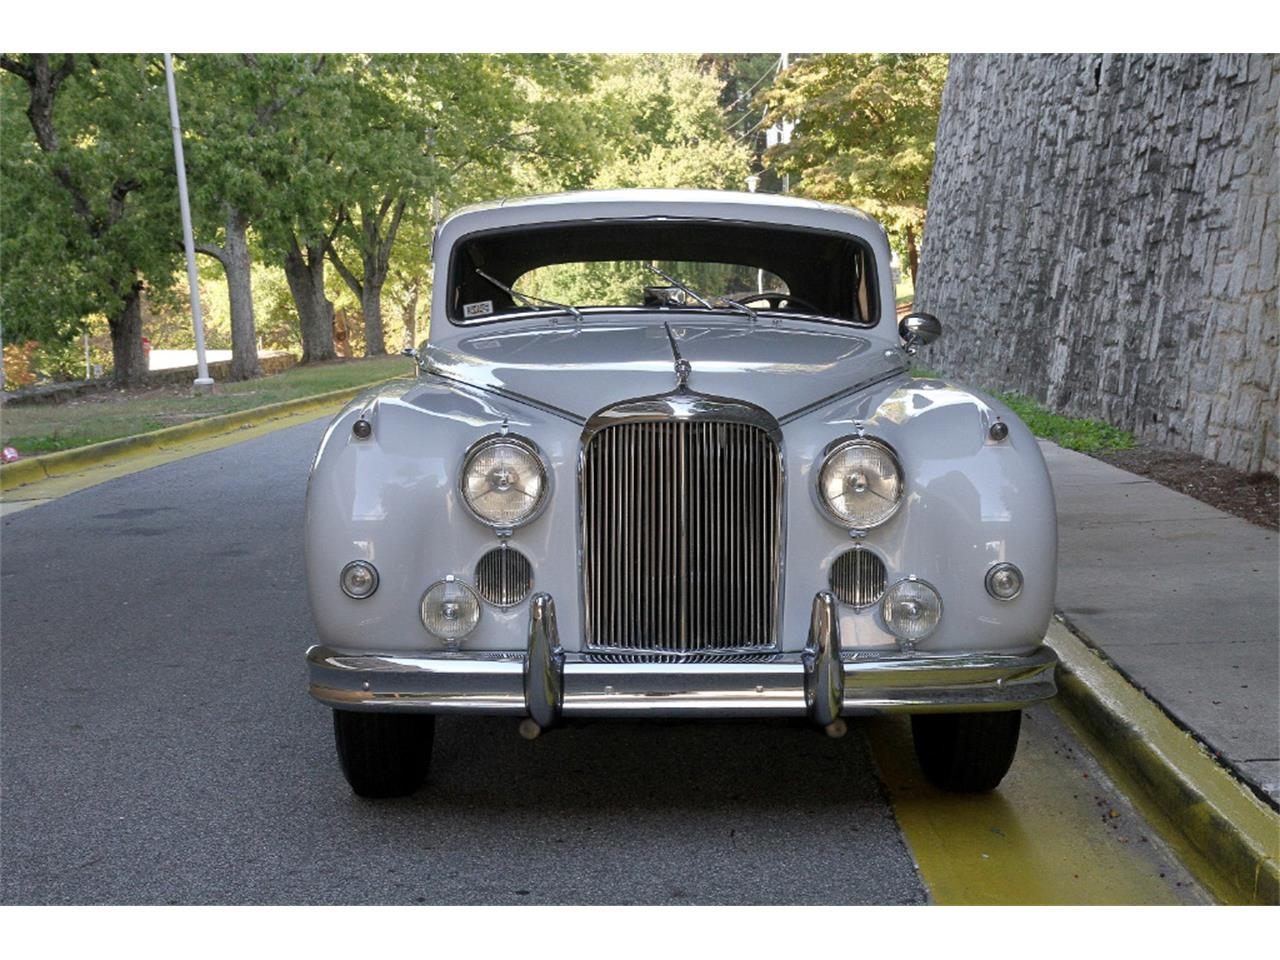 1958 Jaguar Mark VIII for Sale | ClassicCars.com | CC-914317